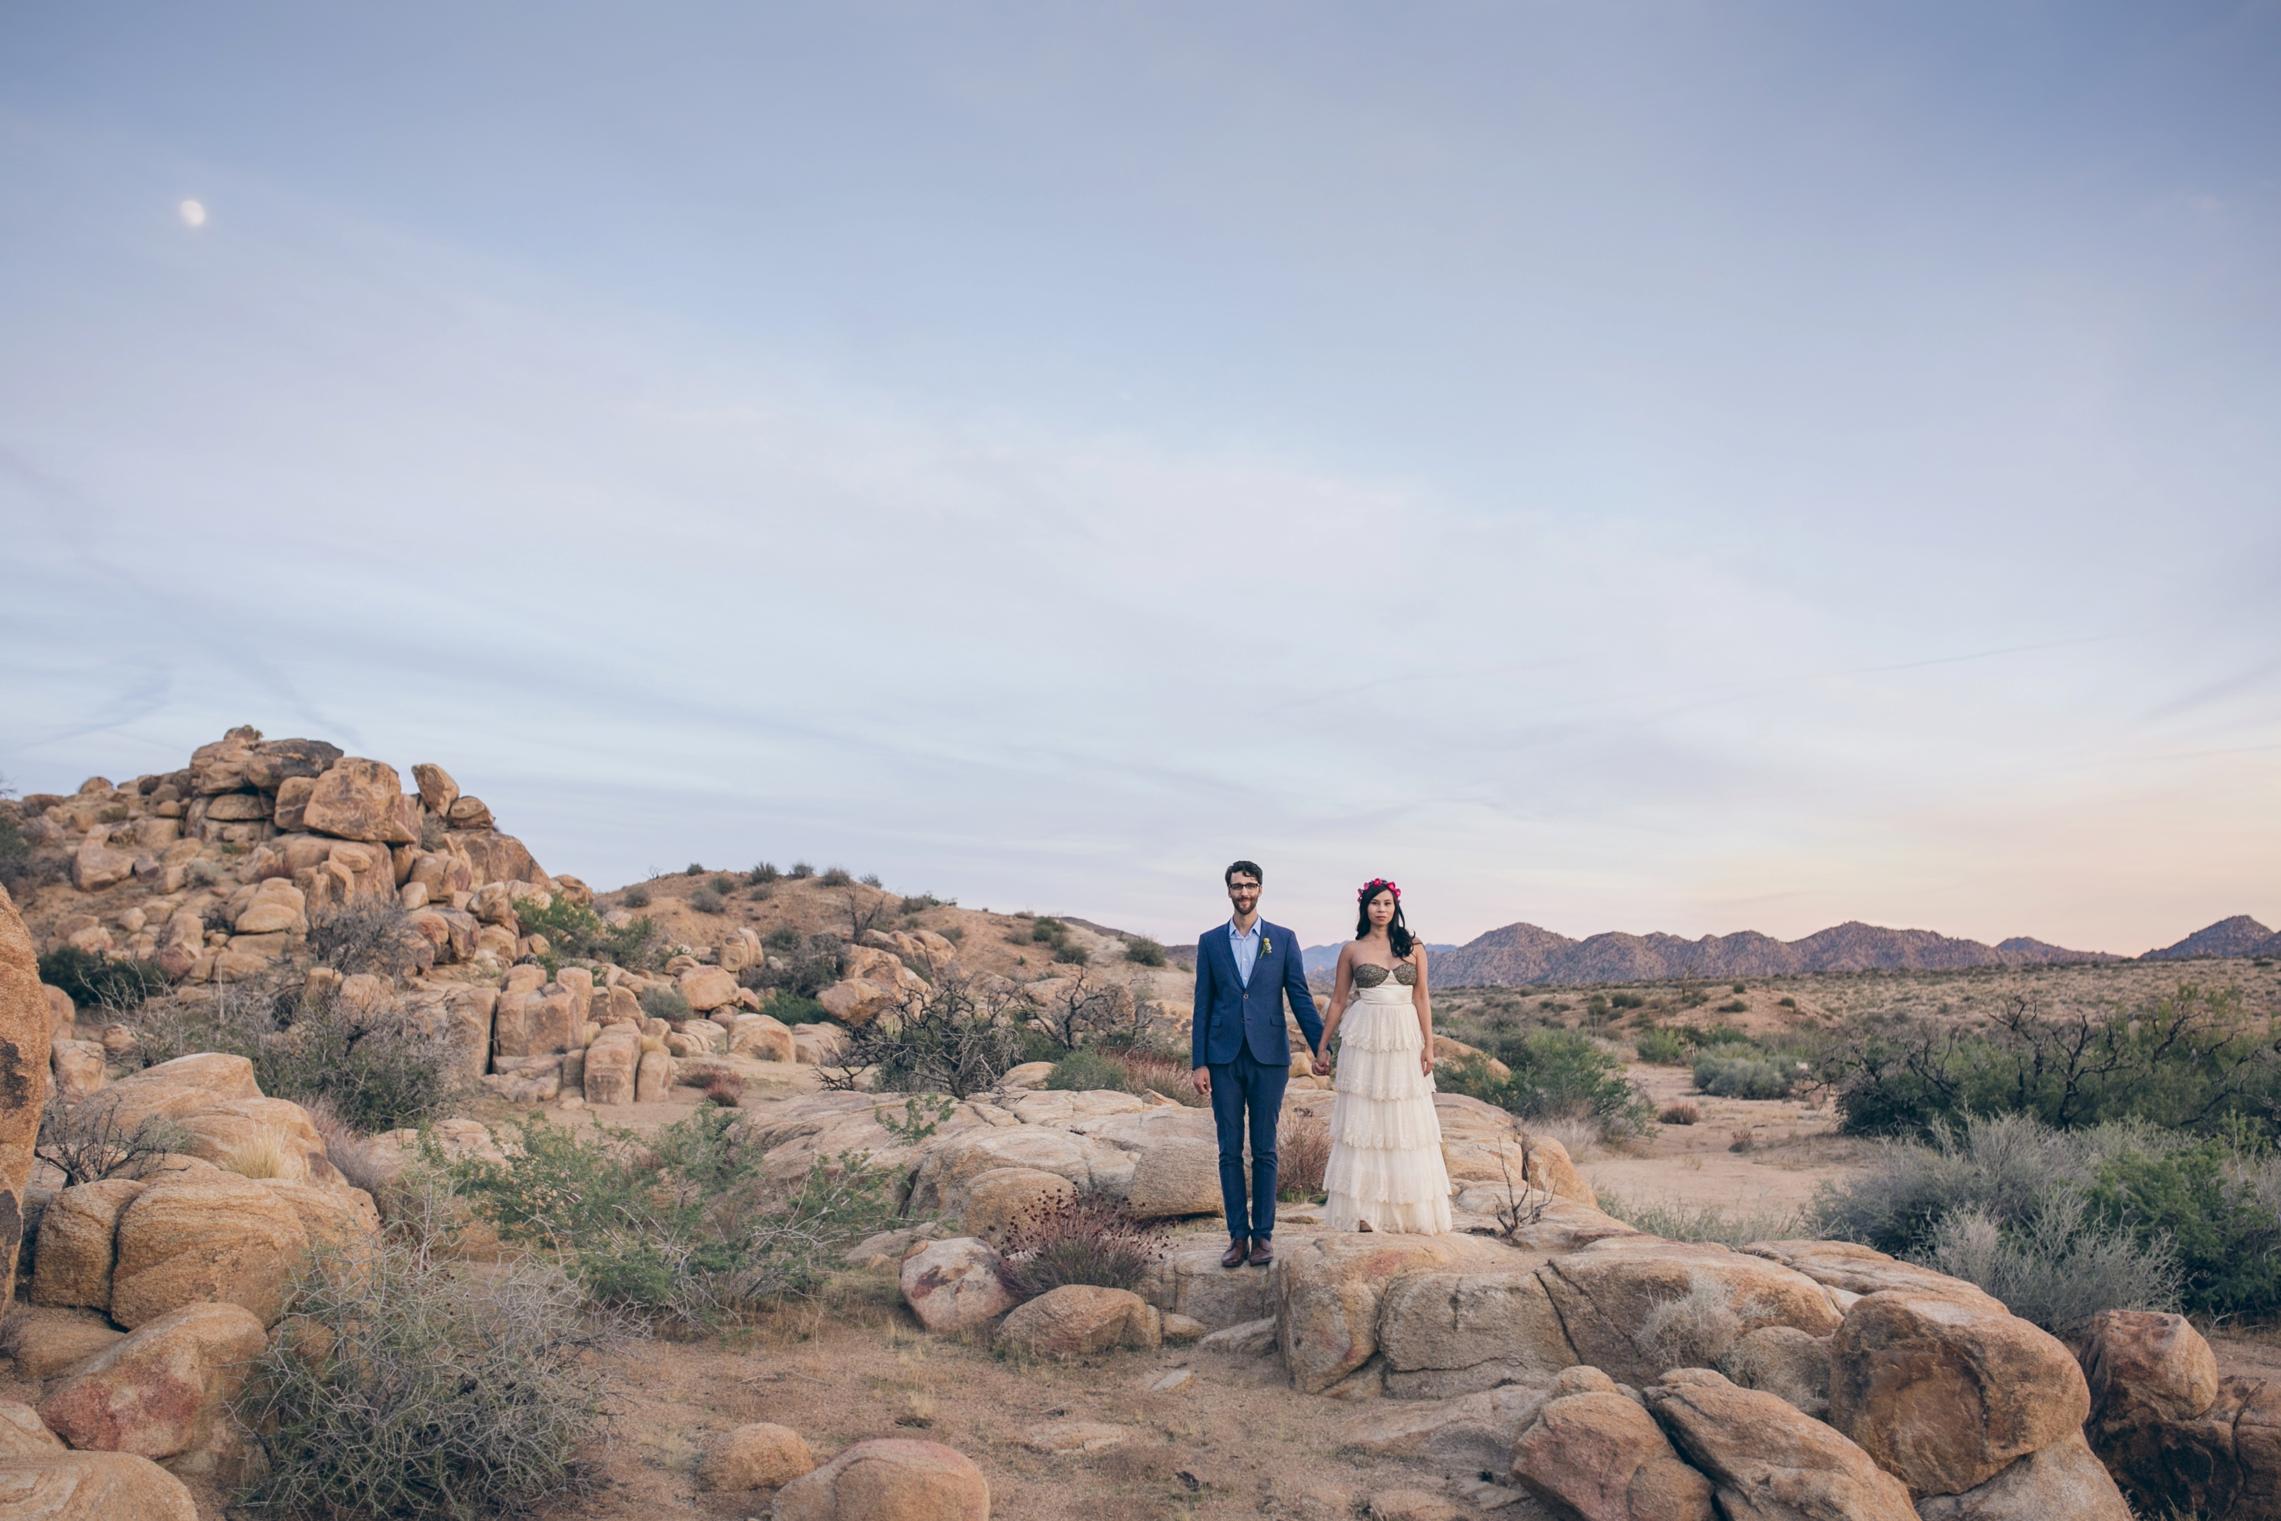 Joshua-Tree-Wedding-Rimrock-Ranch_0013.jpg